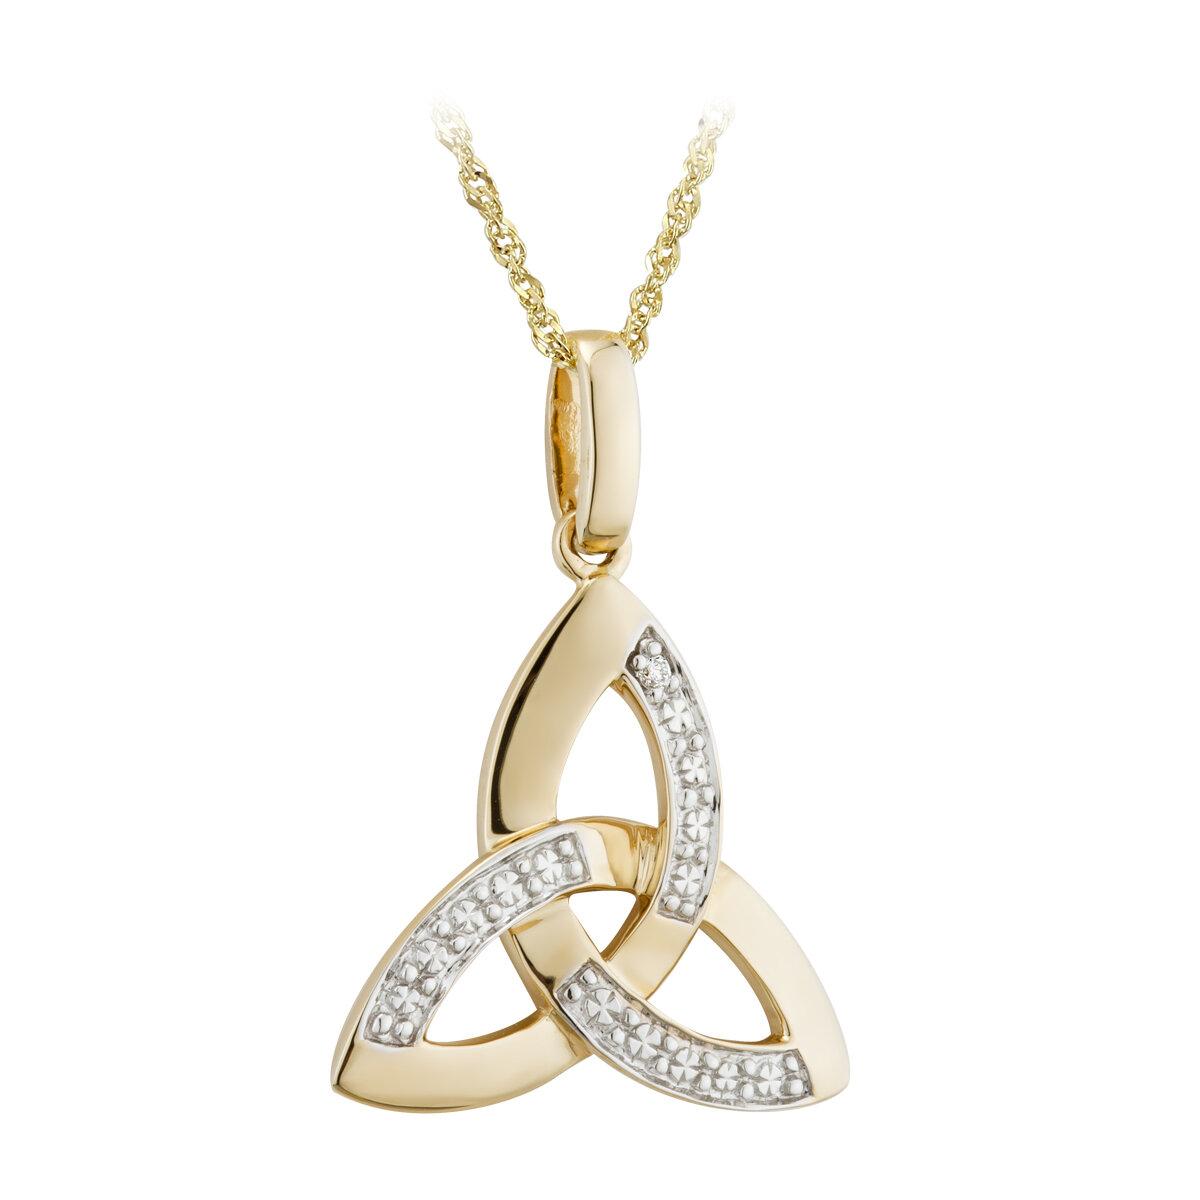 14k two tone gold diamond trinity knot pendant s44419 from Solvar